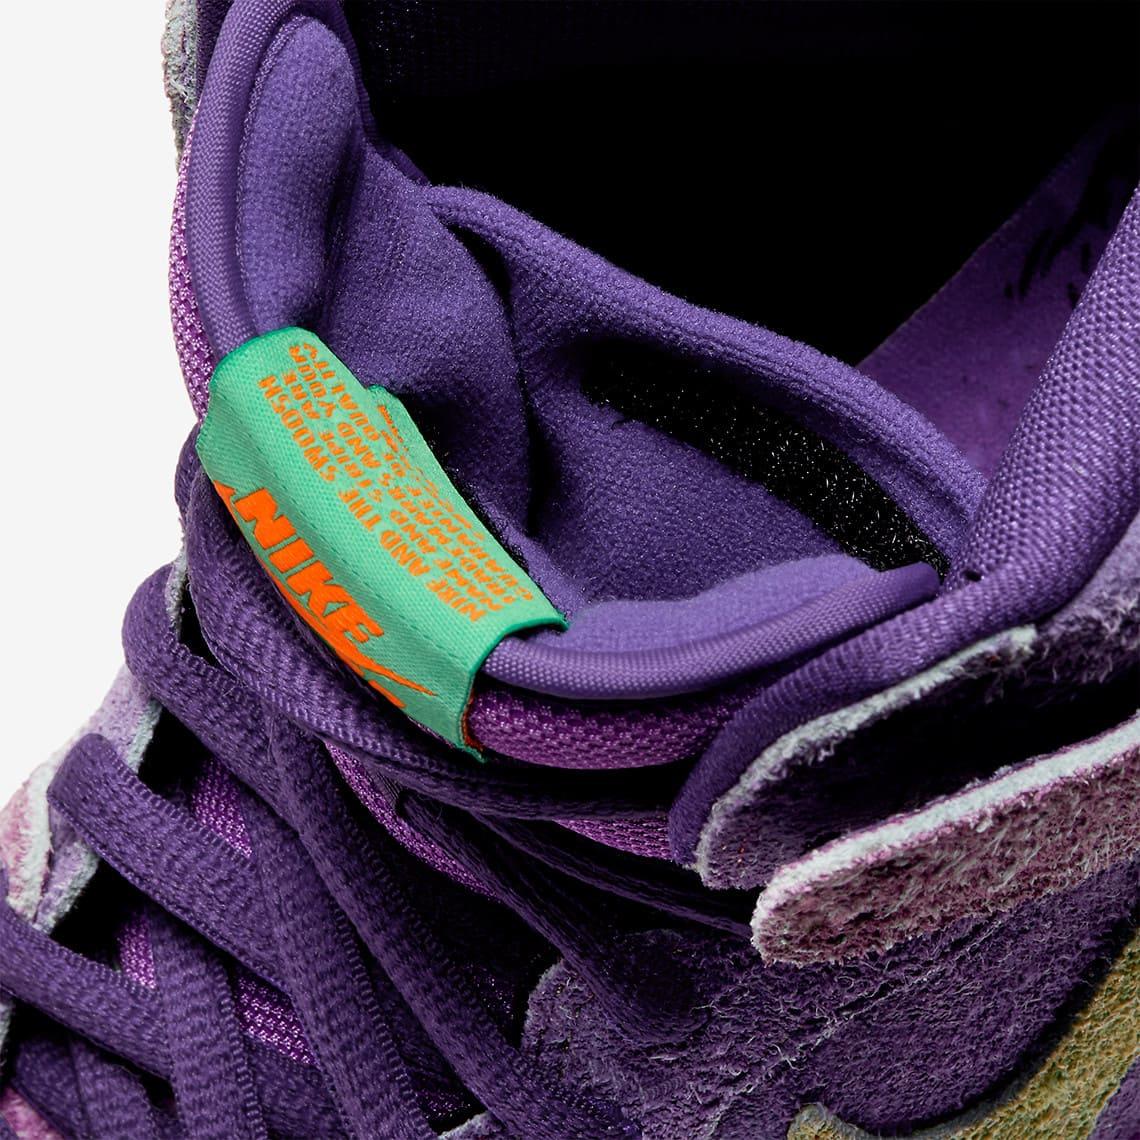 Nike-SB-Dunk-HIgh-Reverse-Skunk-CW9971_500-release